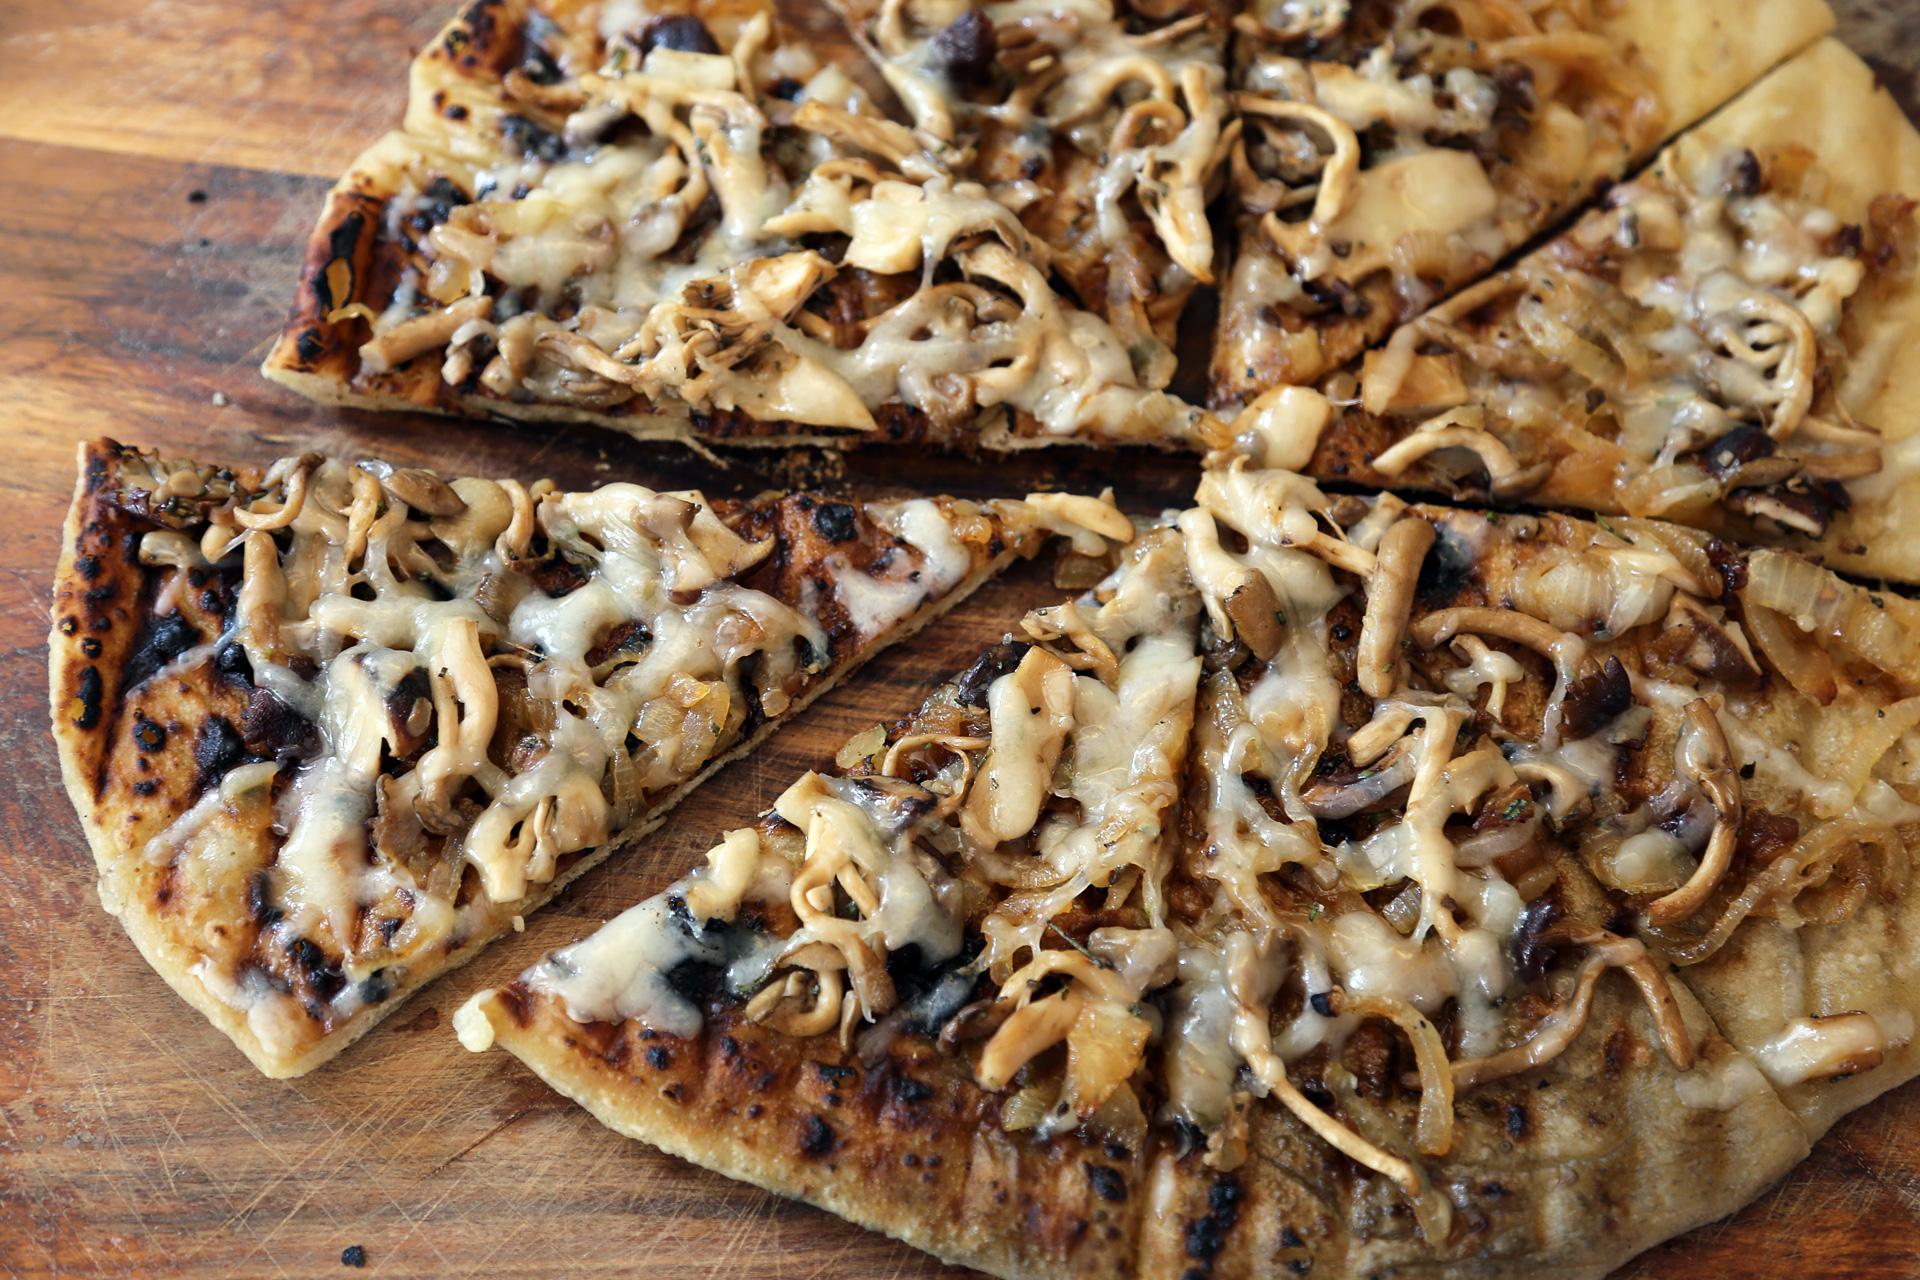 Wild Mushroom Grilled Pizza